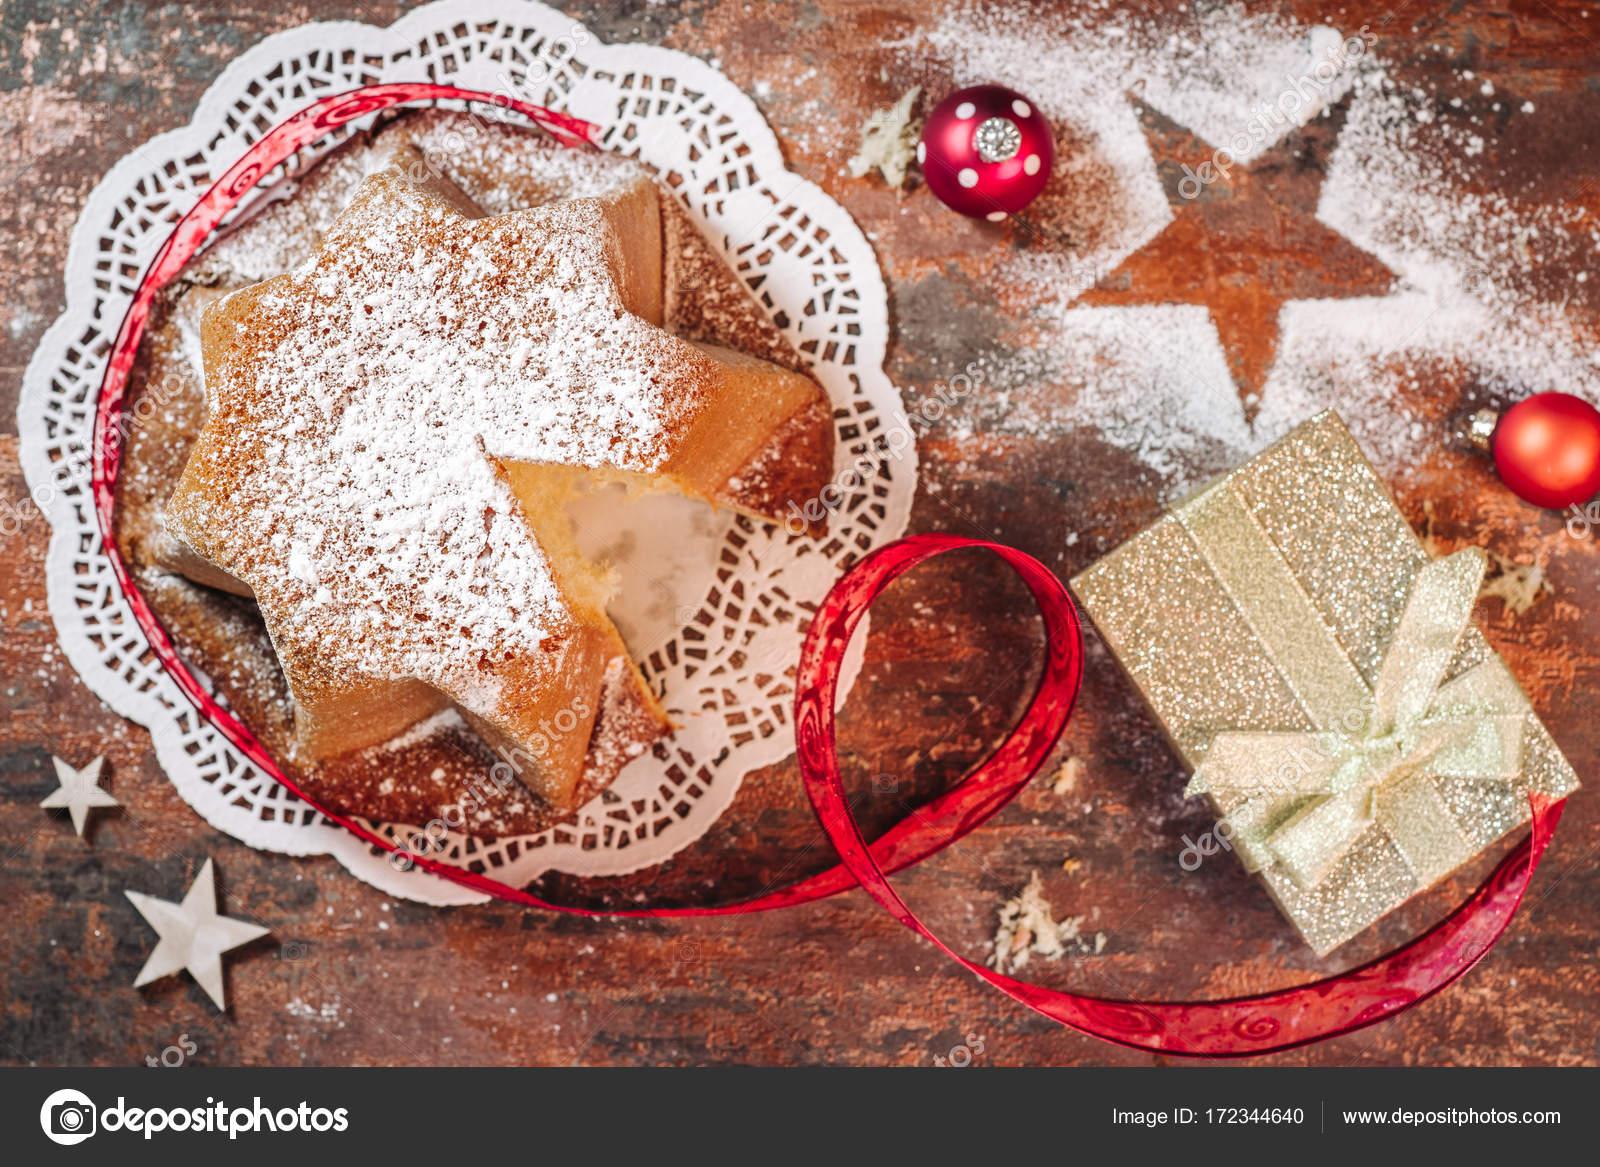 Italienische Pandoro Kuchen Stockfoto C Sabinoparente 172344640